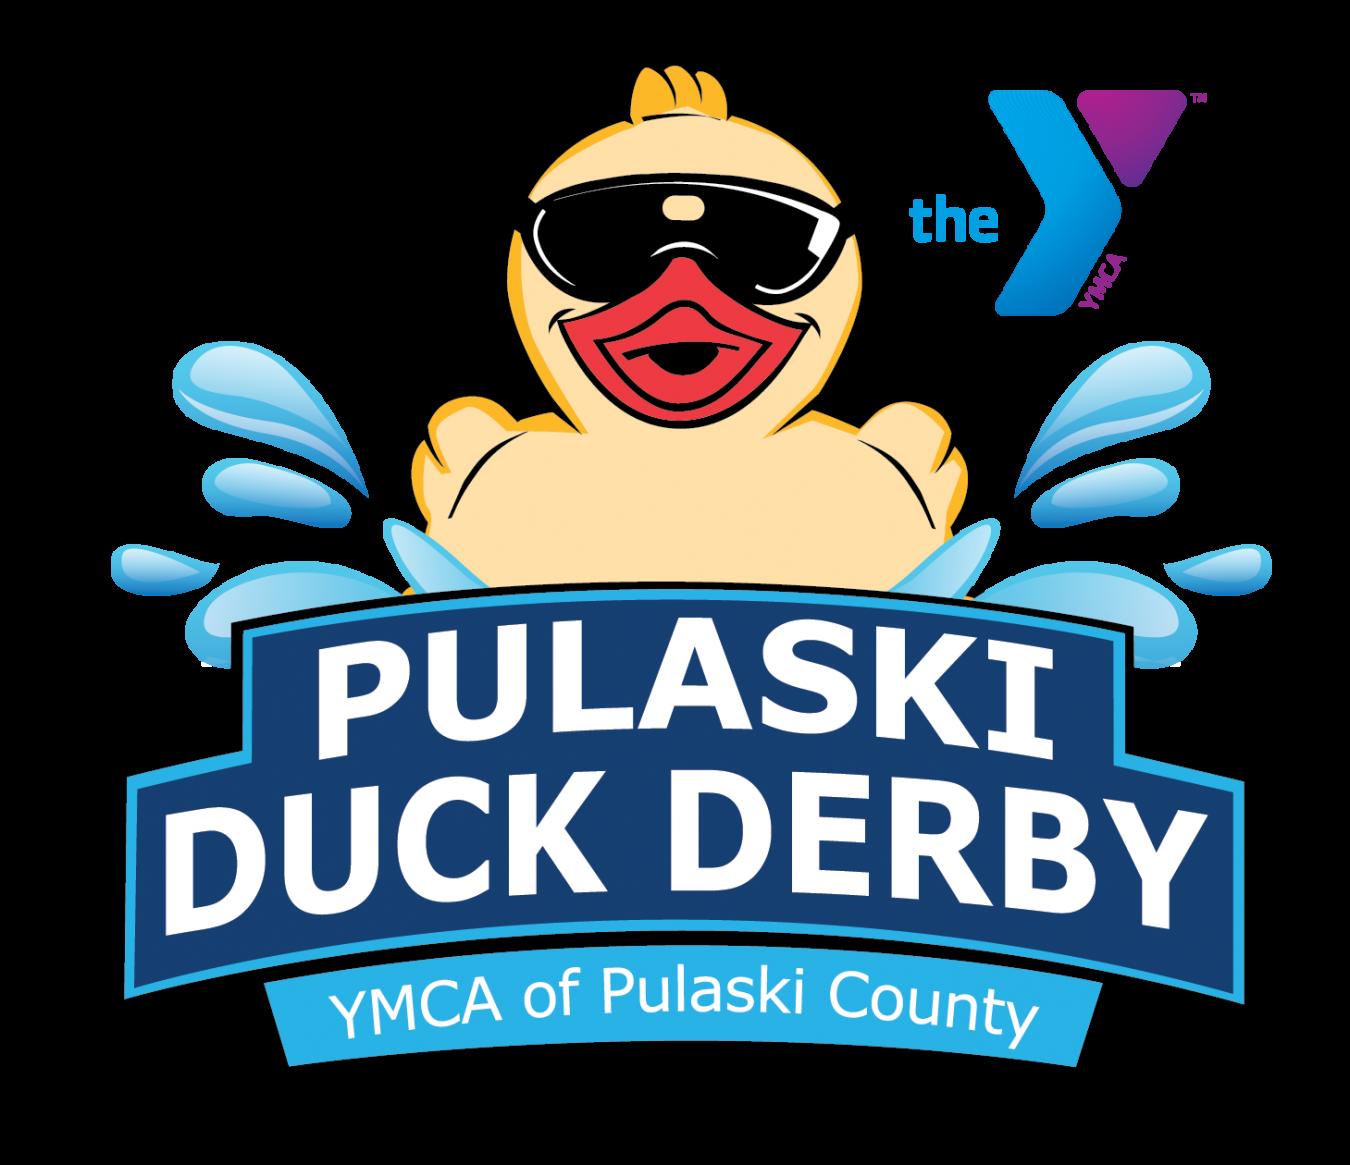 The YMCA of Pulaski Virginia's Duck Derby